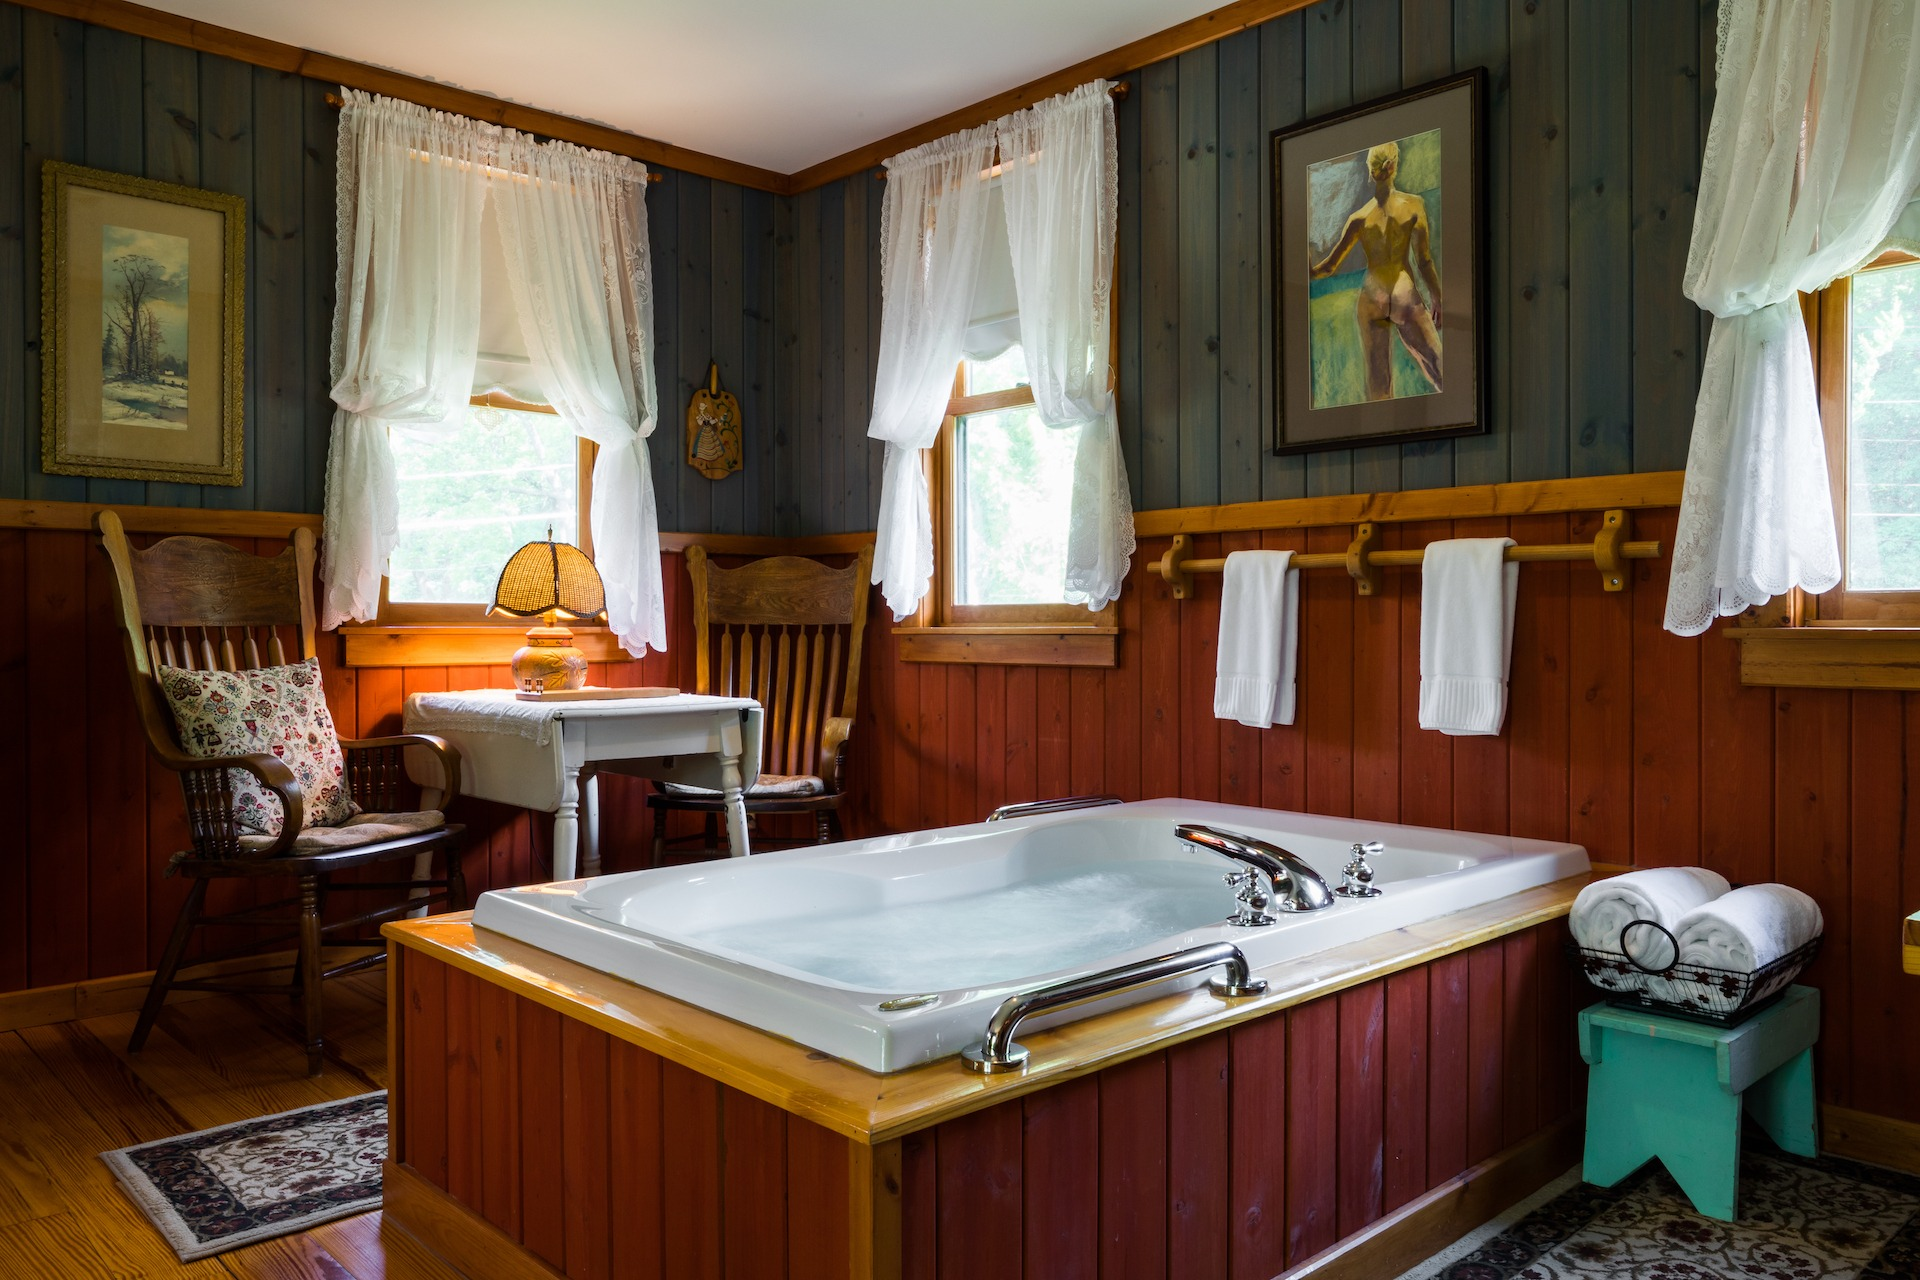 Habberstad-scand (1) - Habberstad House Bed and Breakfast